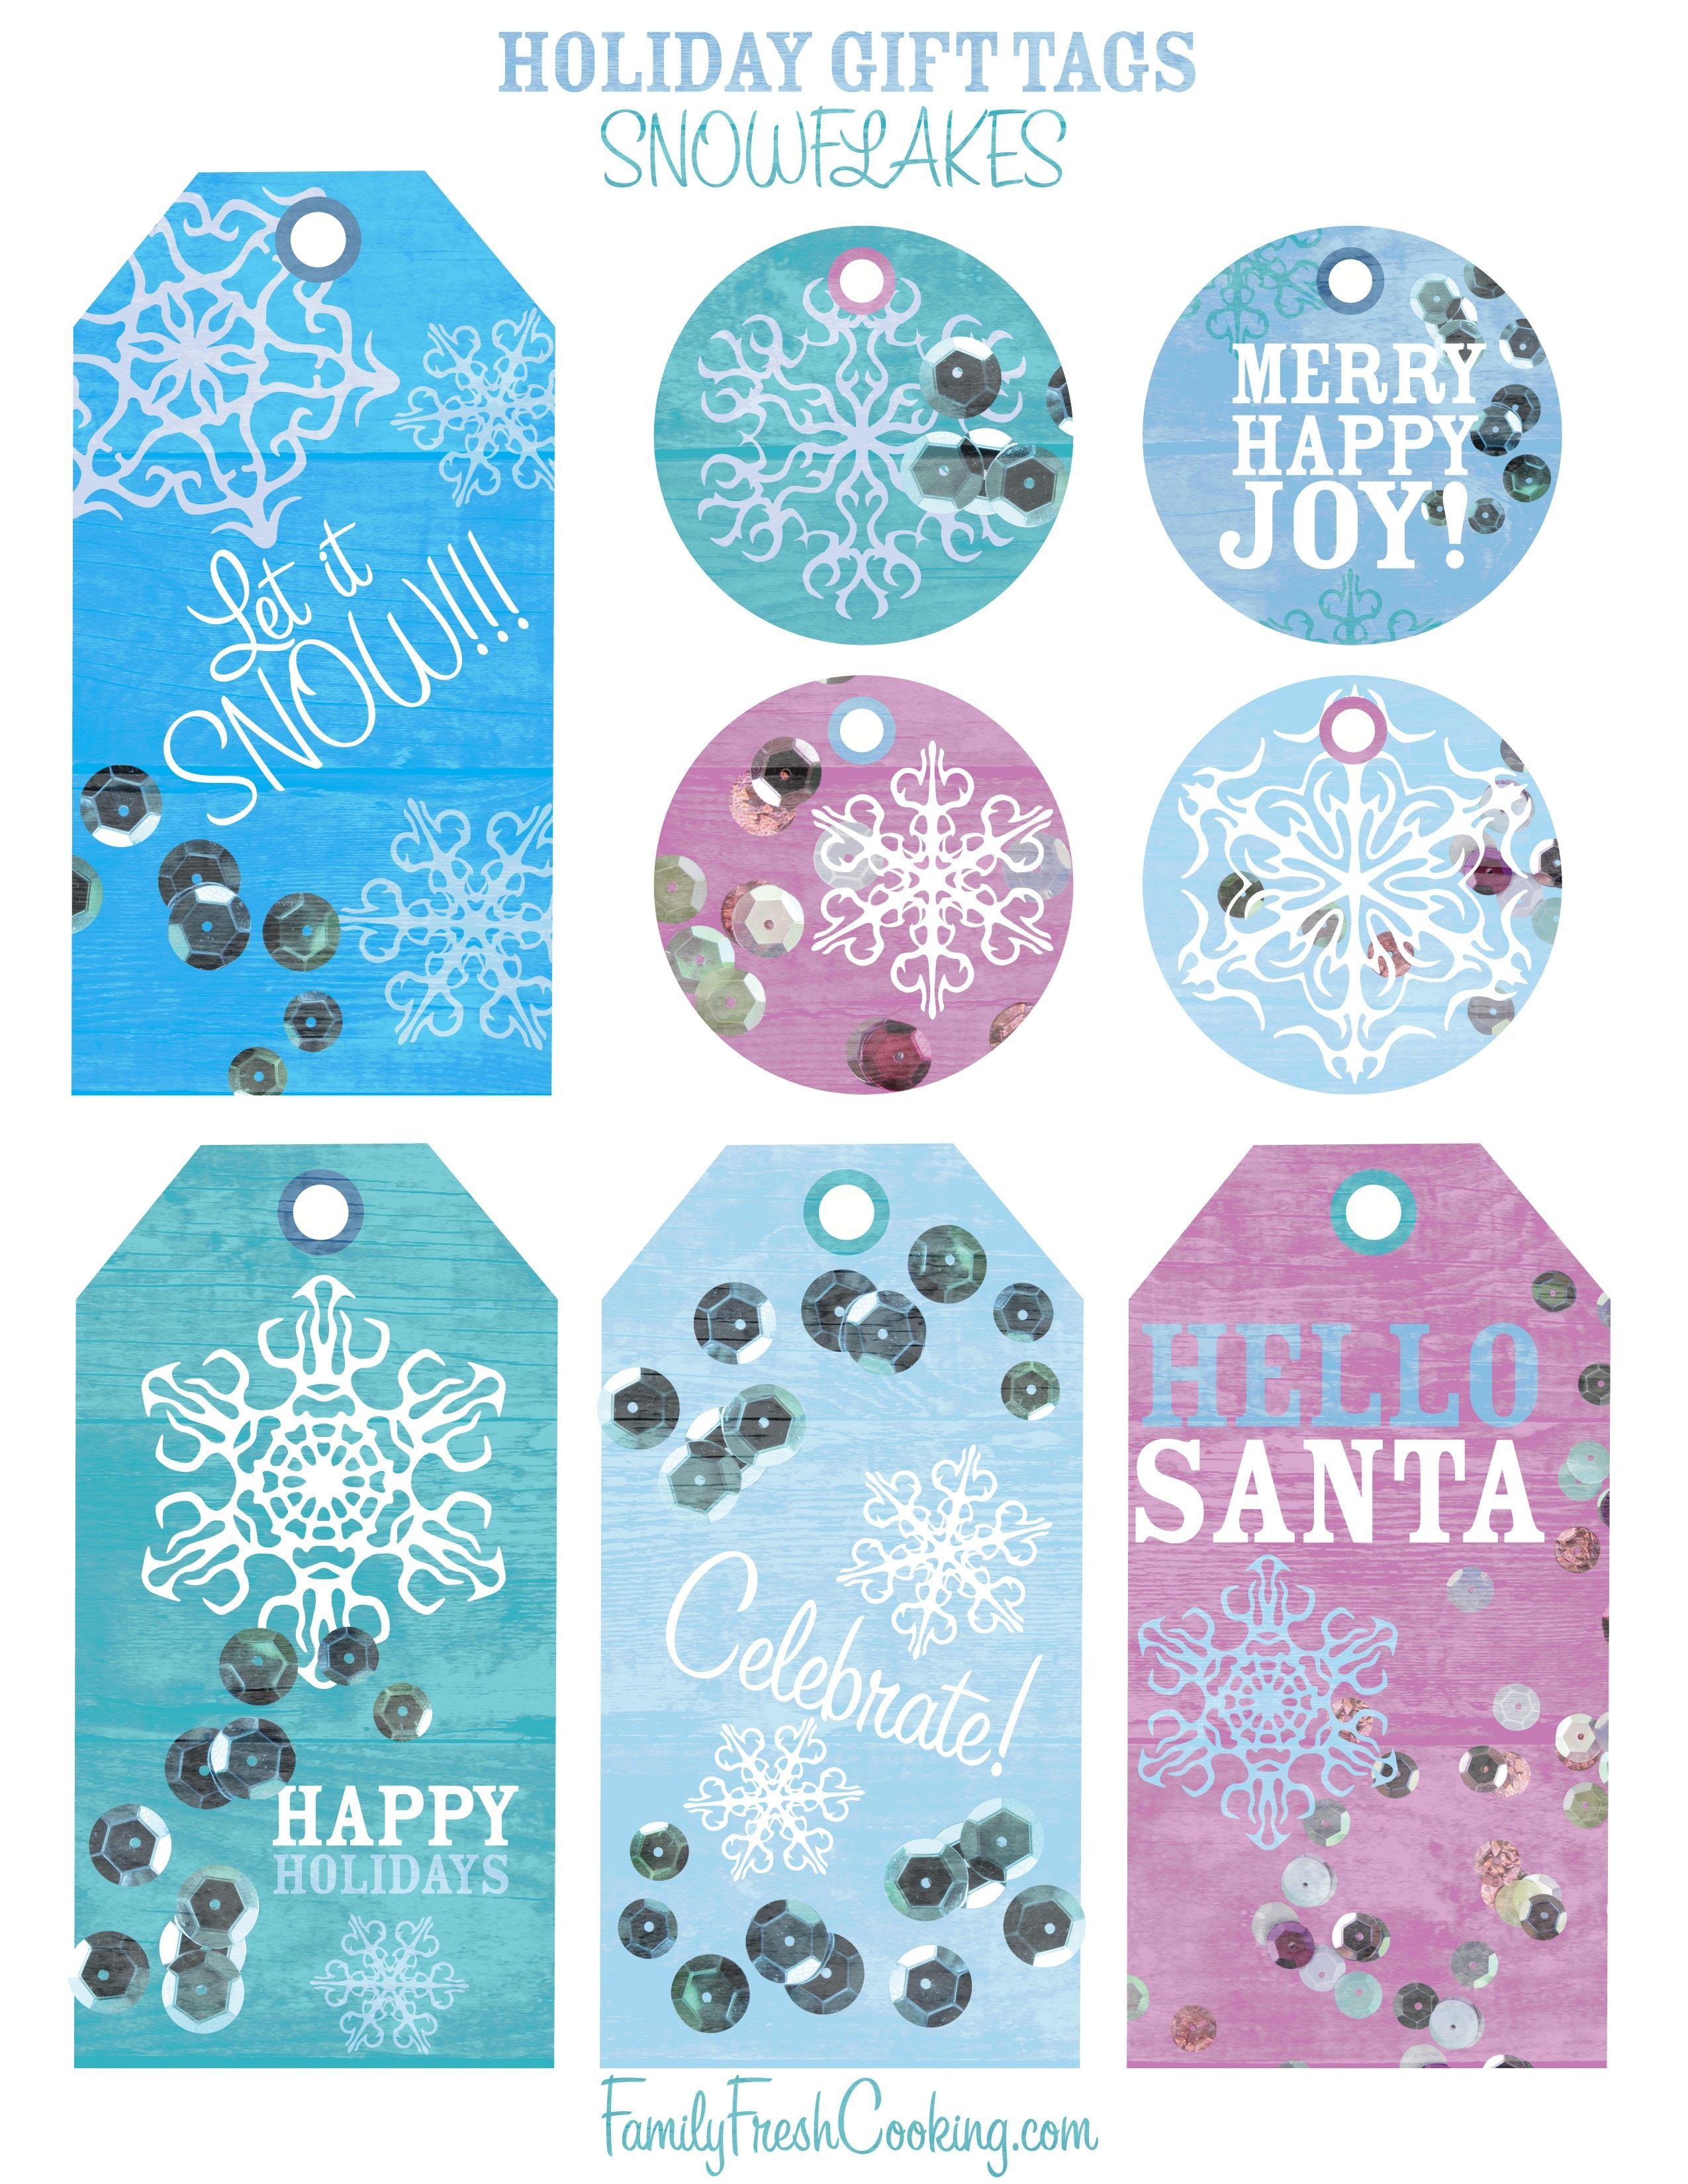 Snowflakes ~ Free Printable Holiday Gift Tags - Marla Meridith - Free Printable Holiday Gift Labels